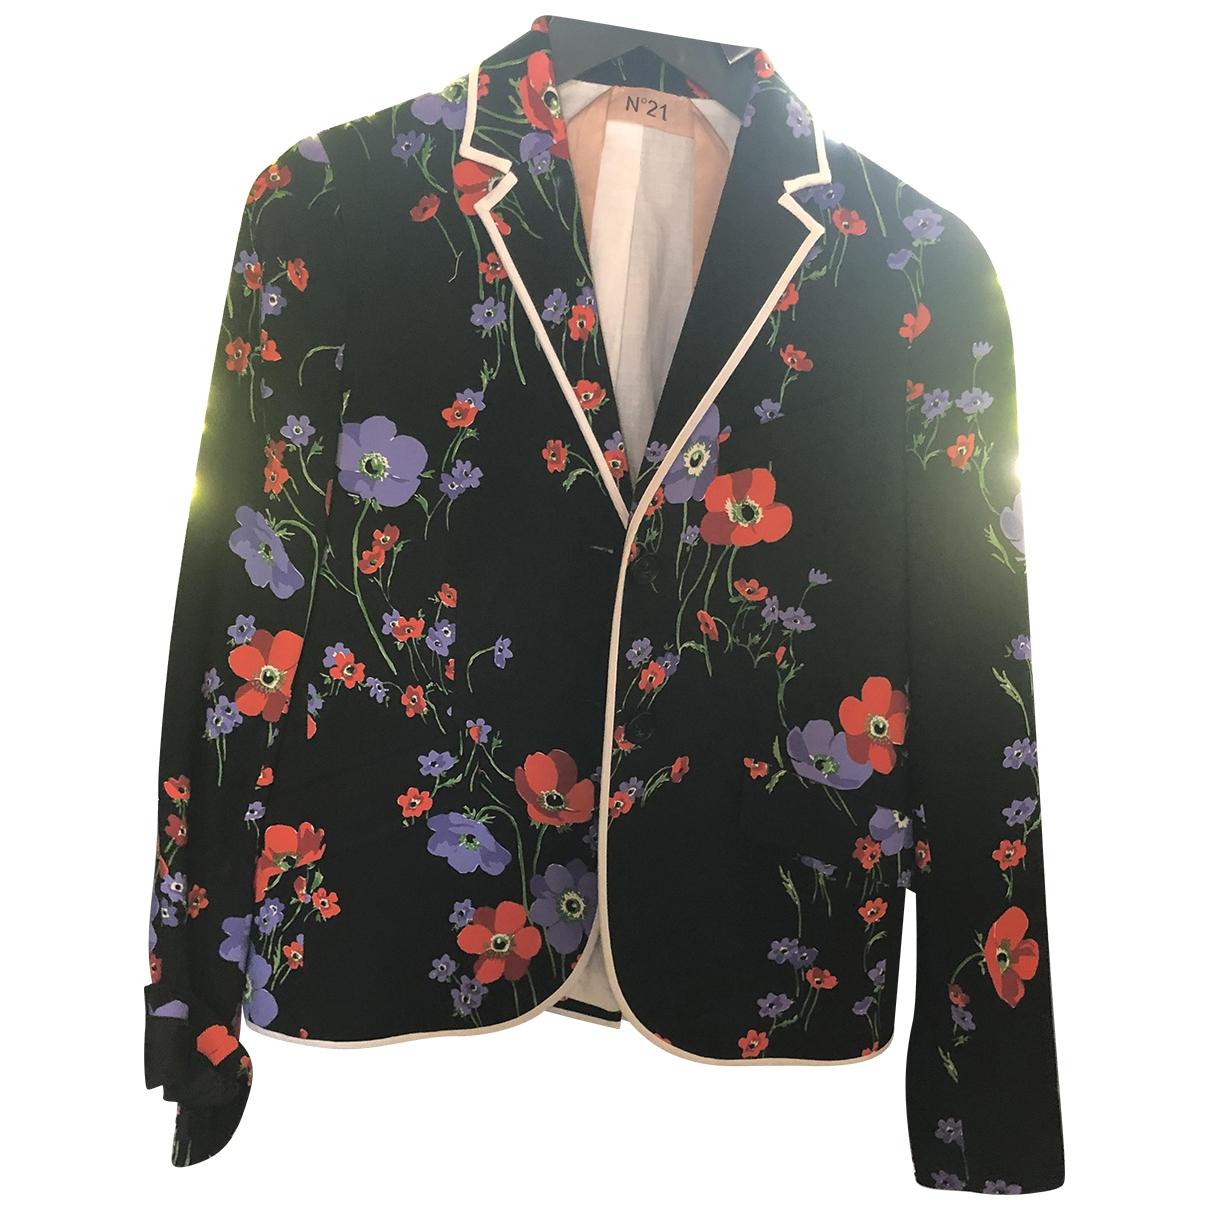 N°21 \N Black jacket for Women 40 IT